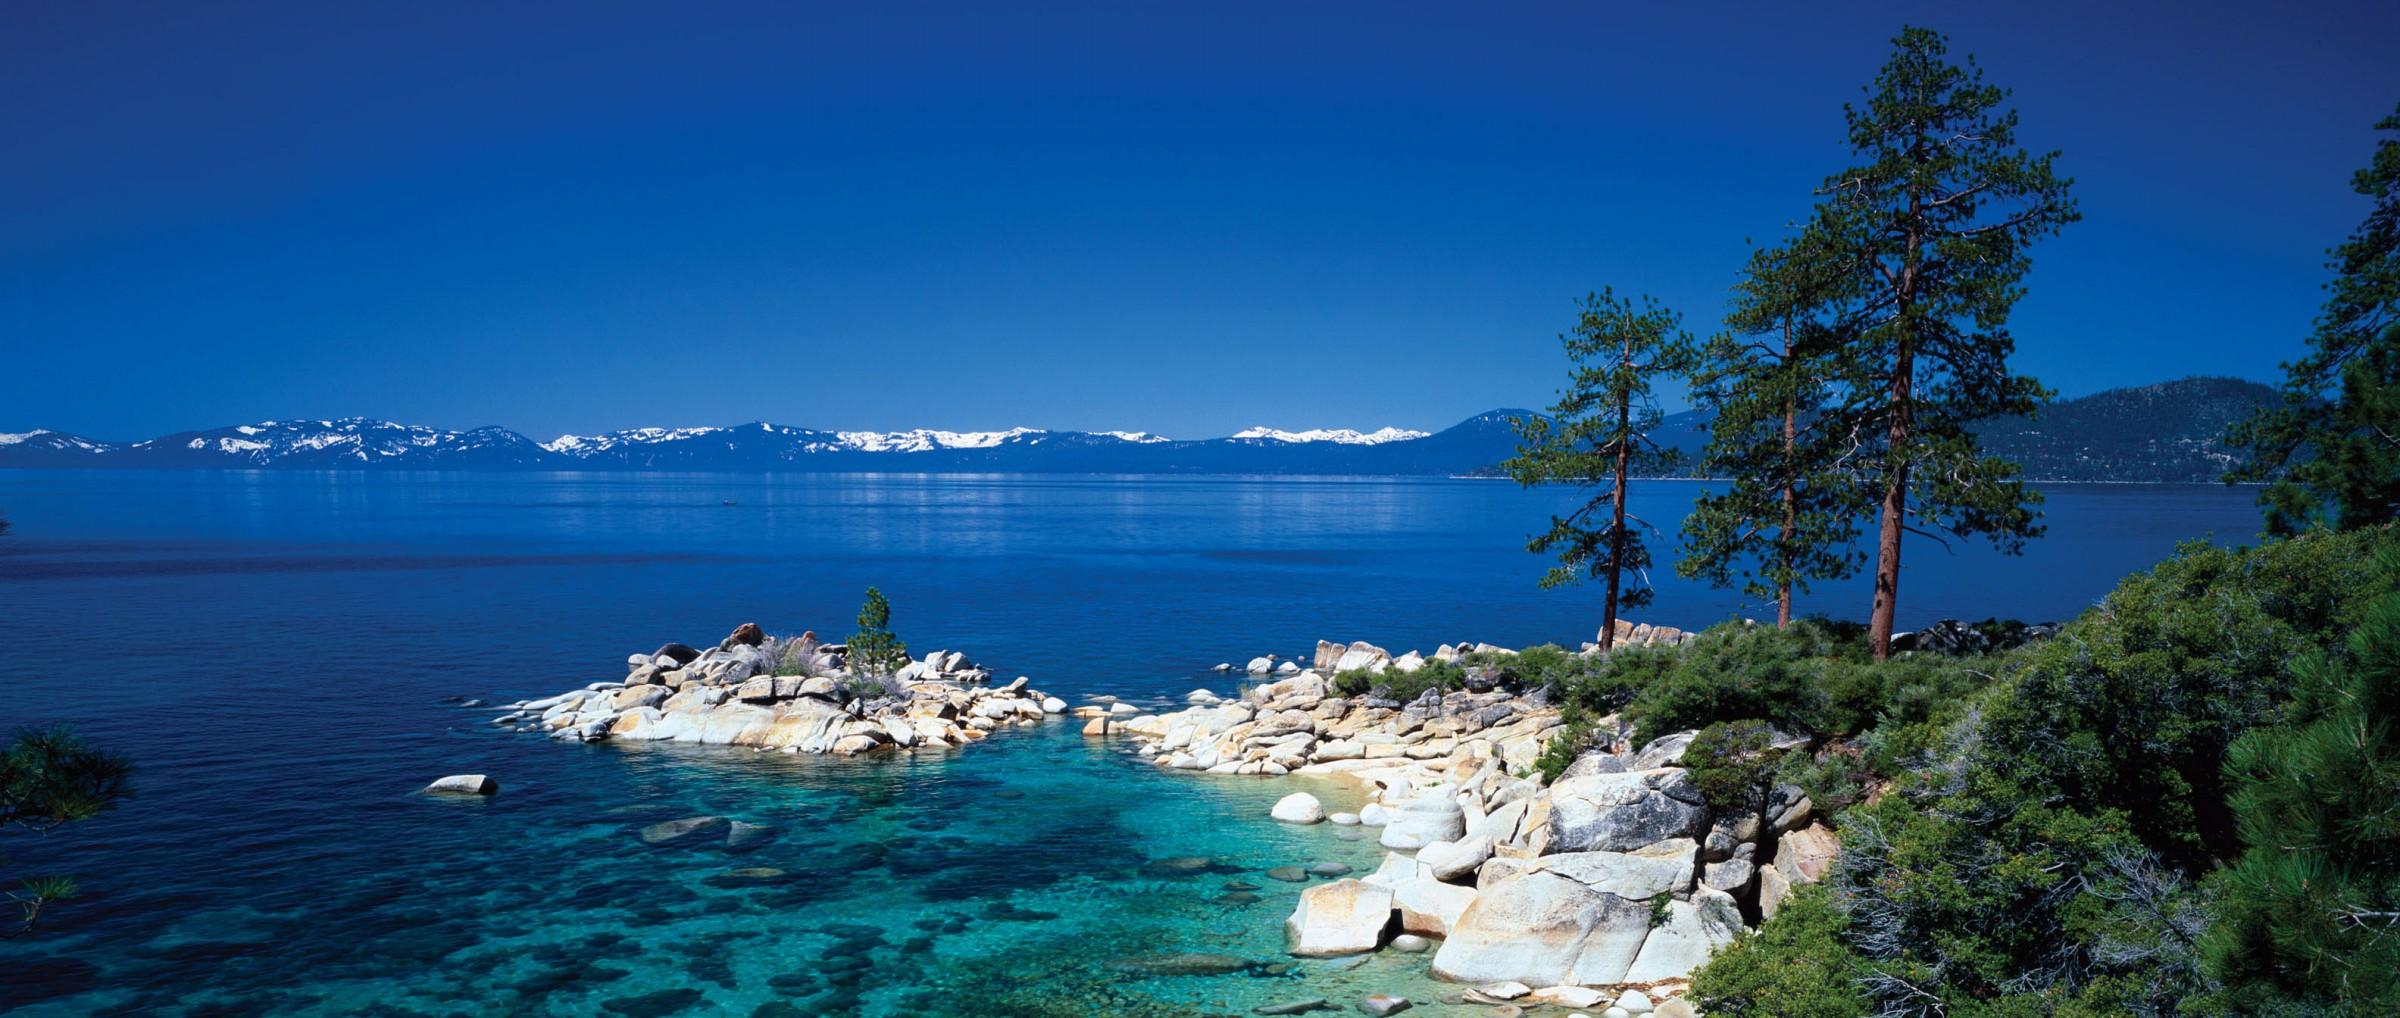 Lake Tahoe Nevada Hotels Resorts